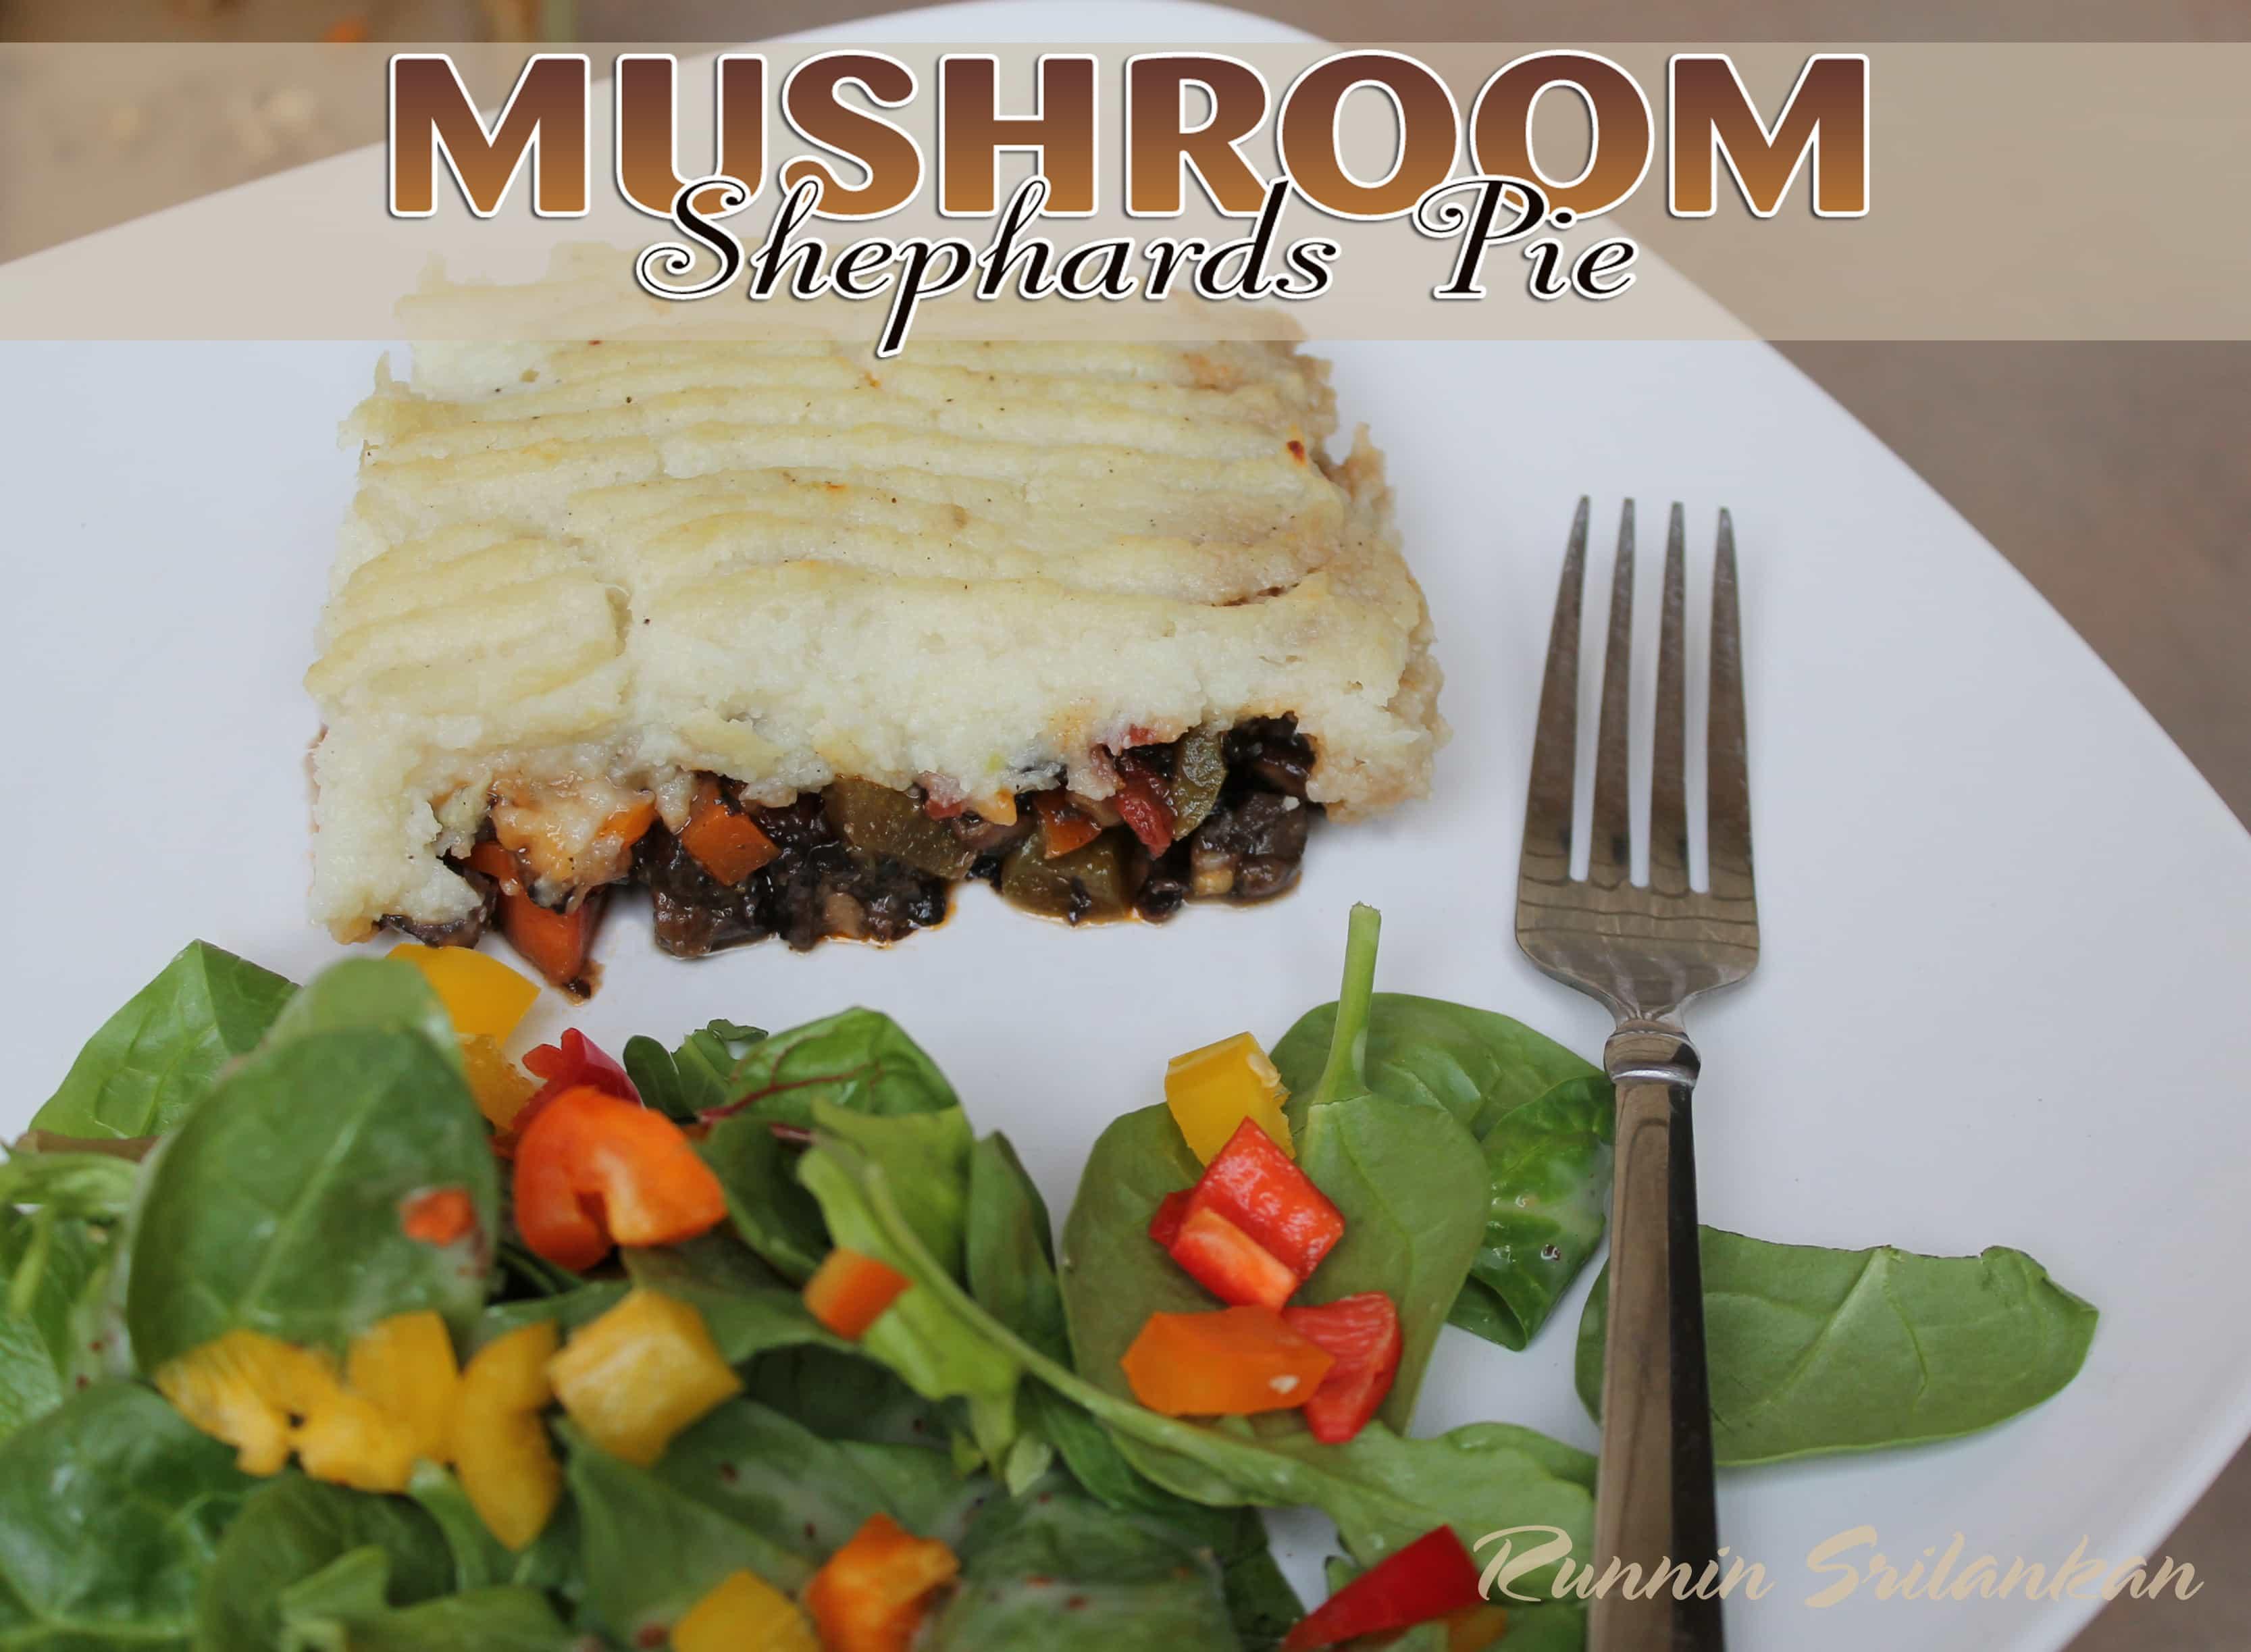 shephards pie with portebello mushrooms